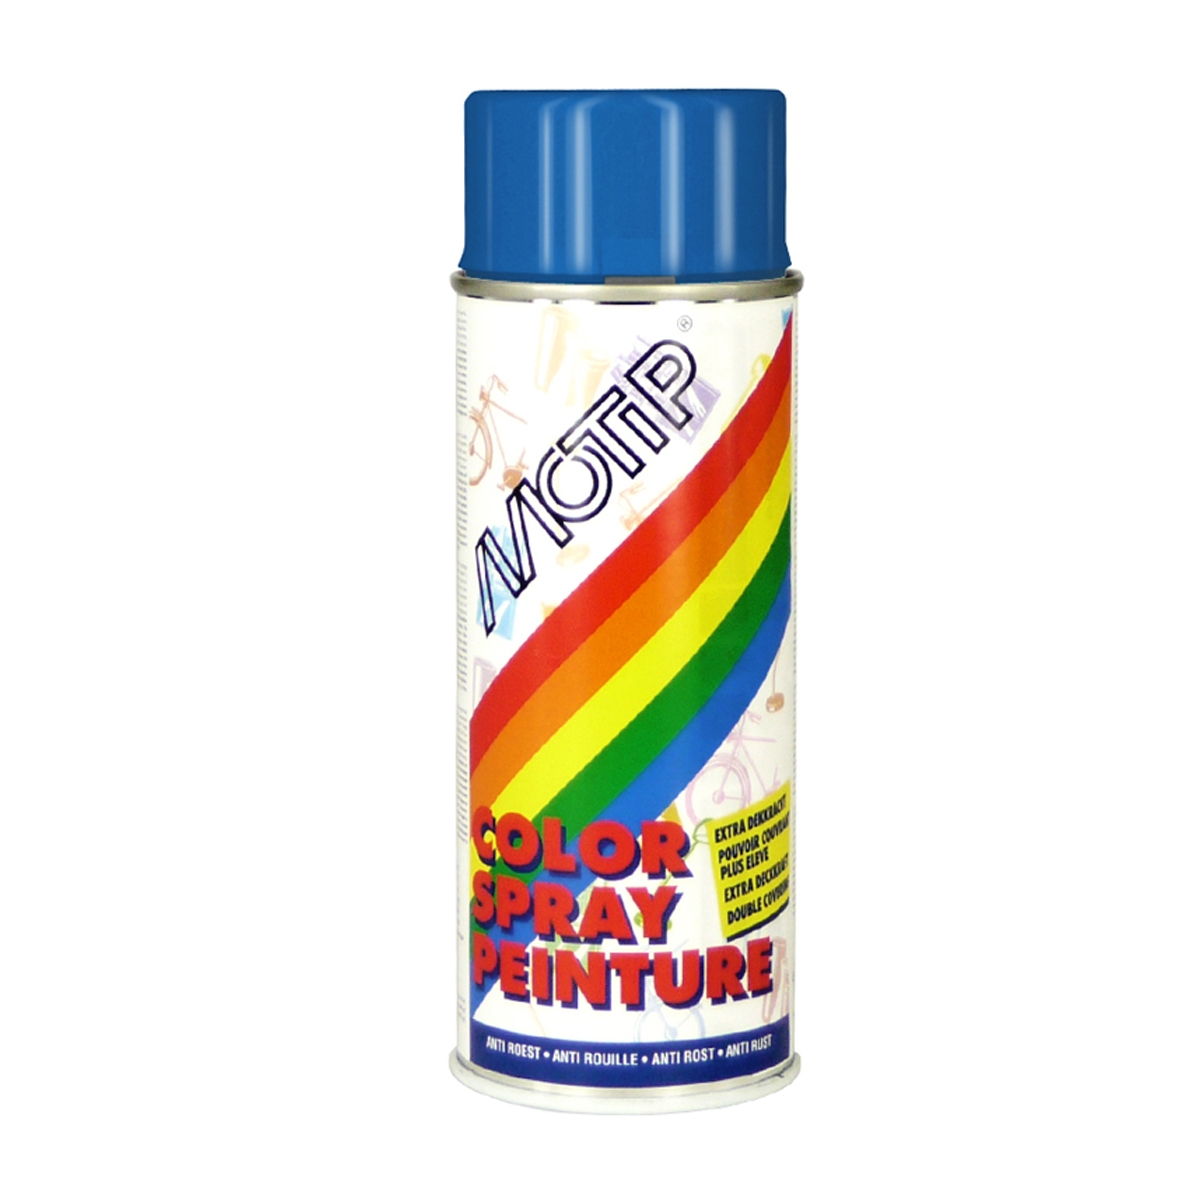 Bombe de peinture MoTip bleu gentiane brillant 400 ml